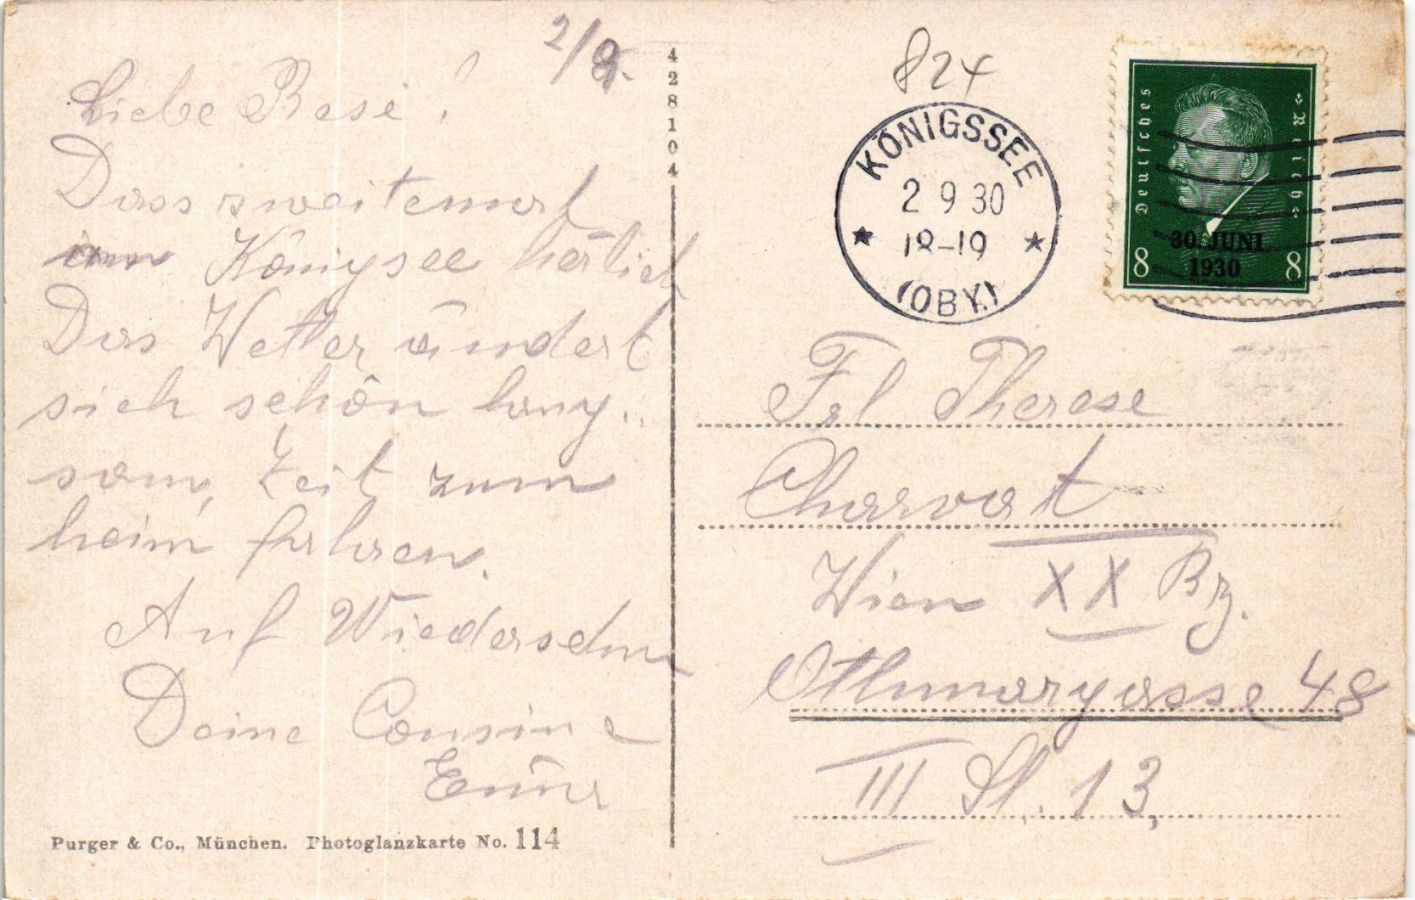 CPA-AK-Konigssee-St-Bartholoma-GERMANY-878964 miniature 2